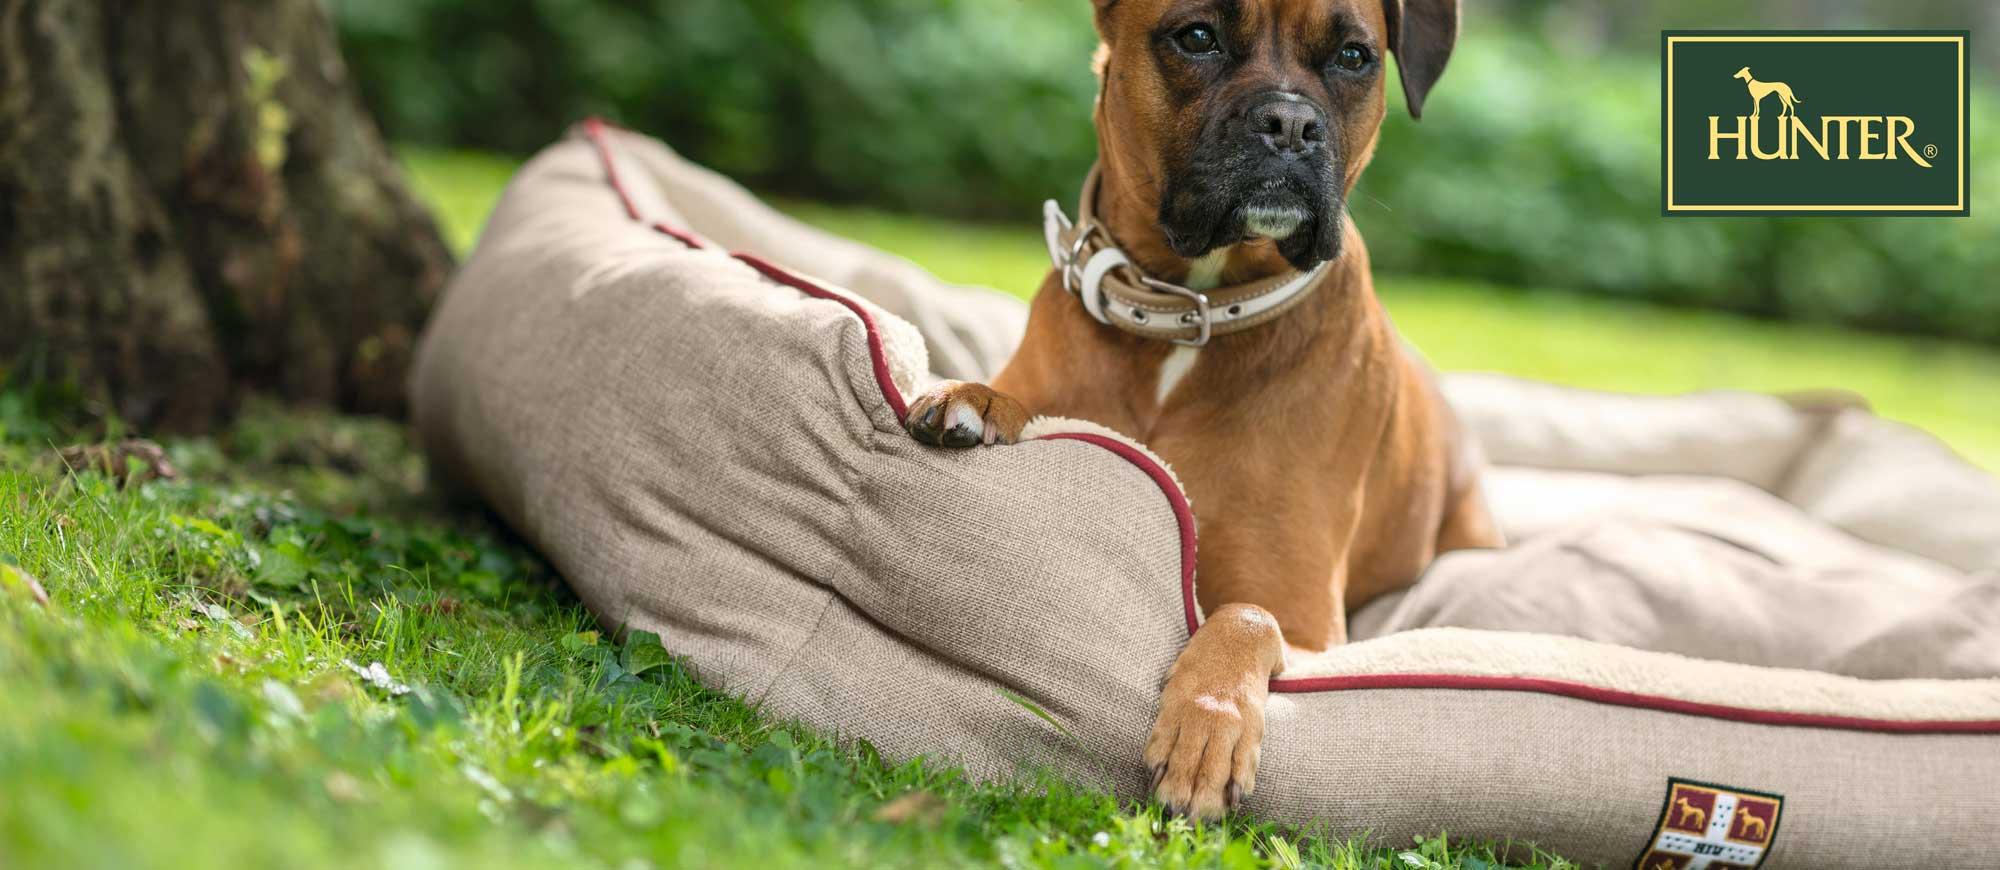 hunter hundebett g nstig bestellen. Black Bedroom Furniture Sets. Home Design Ideas